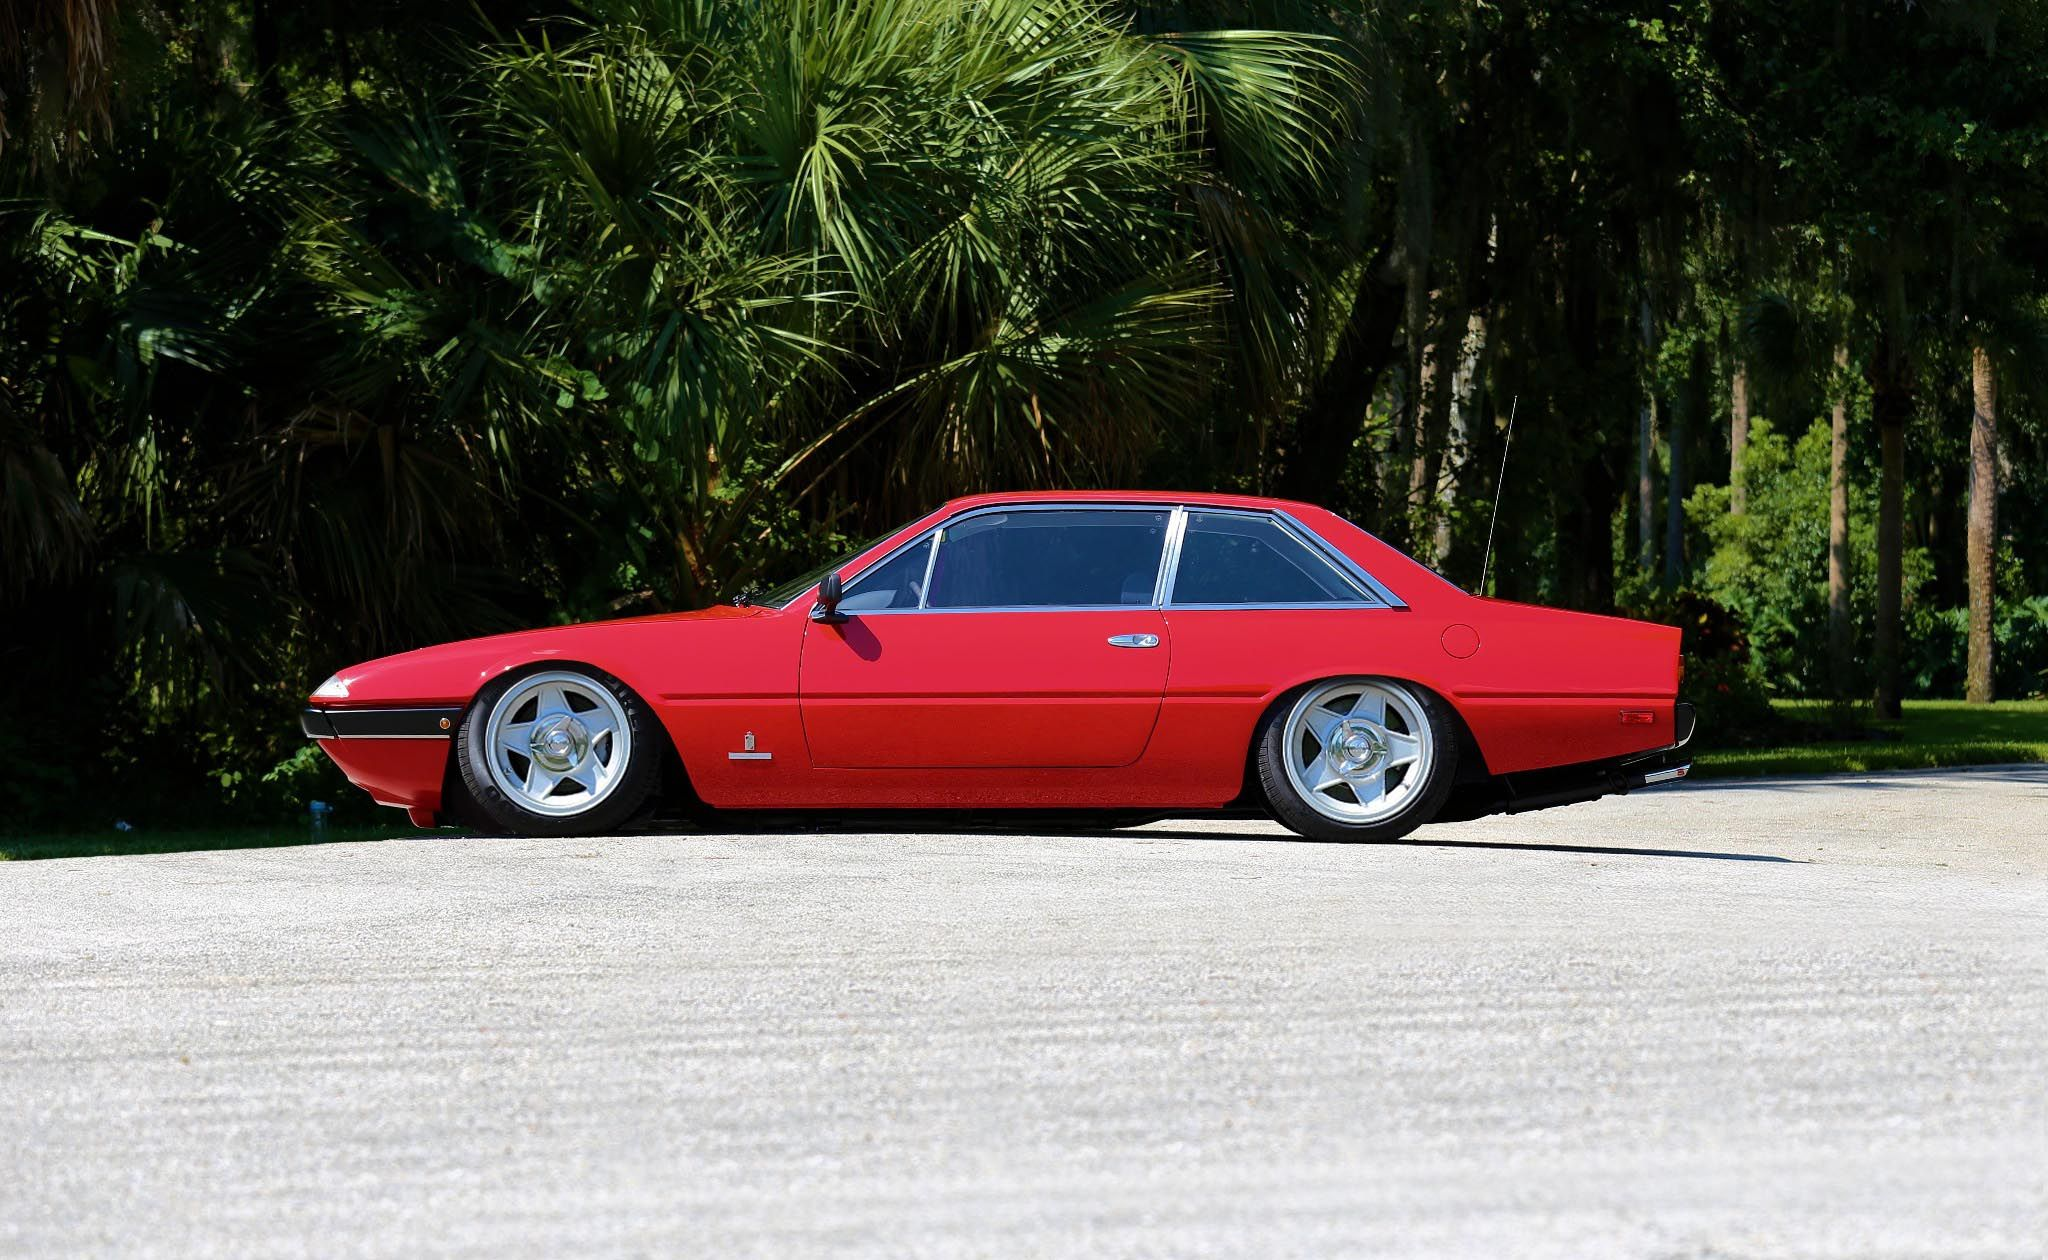 f8b2bbd12a23642c4ebe574e894fccf3 Marvelous Ferrari Mondial 8 Te Koop Cars Trend